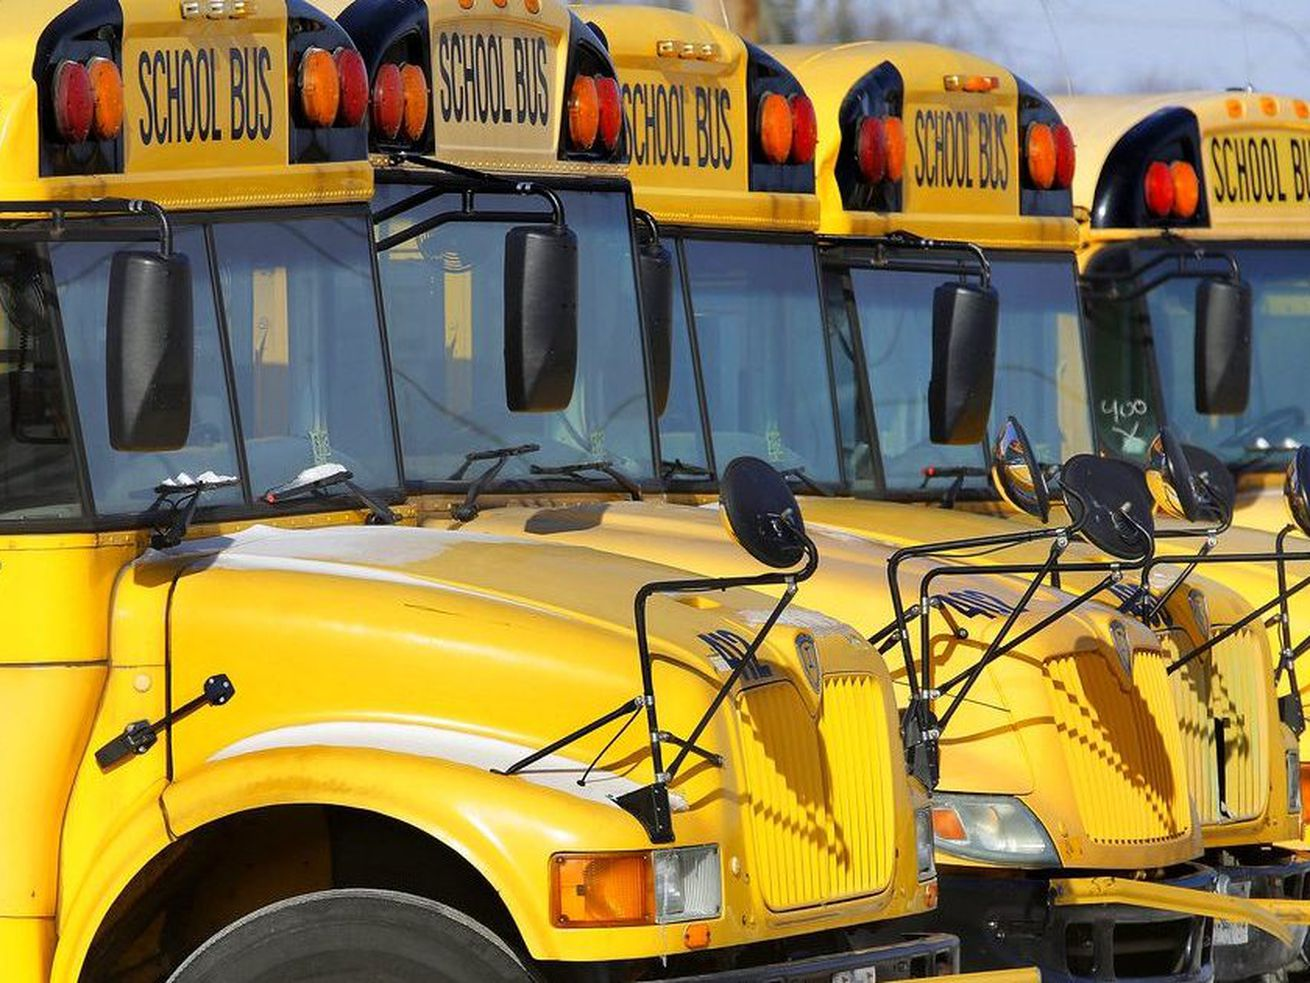 A fleet of yellow school buses